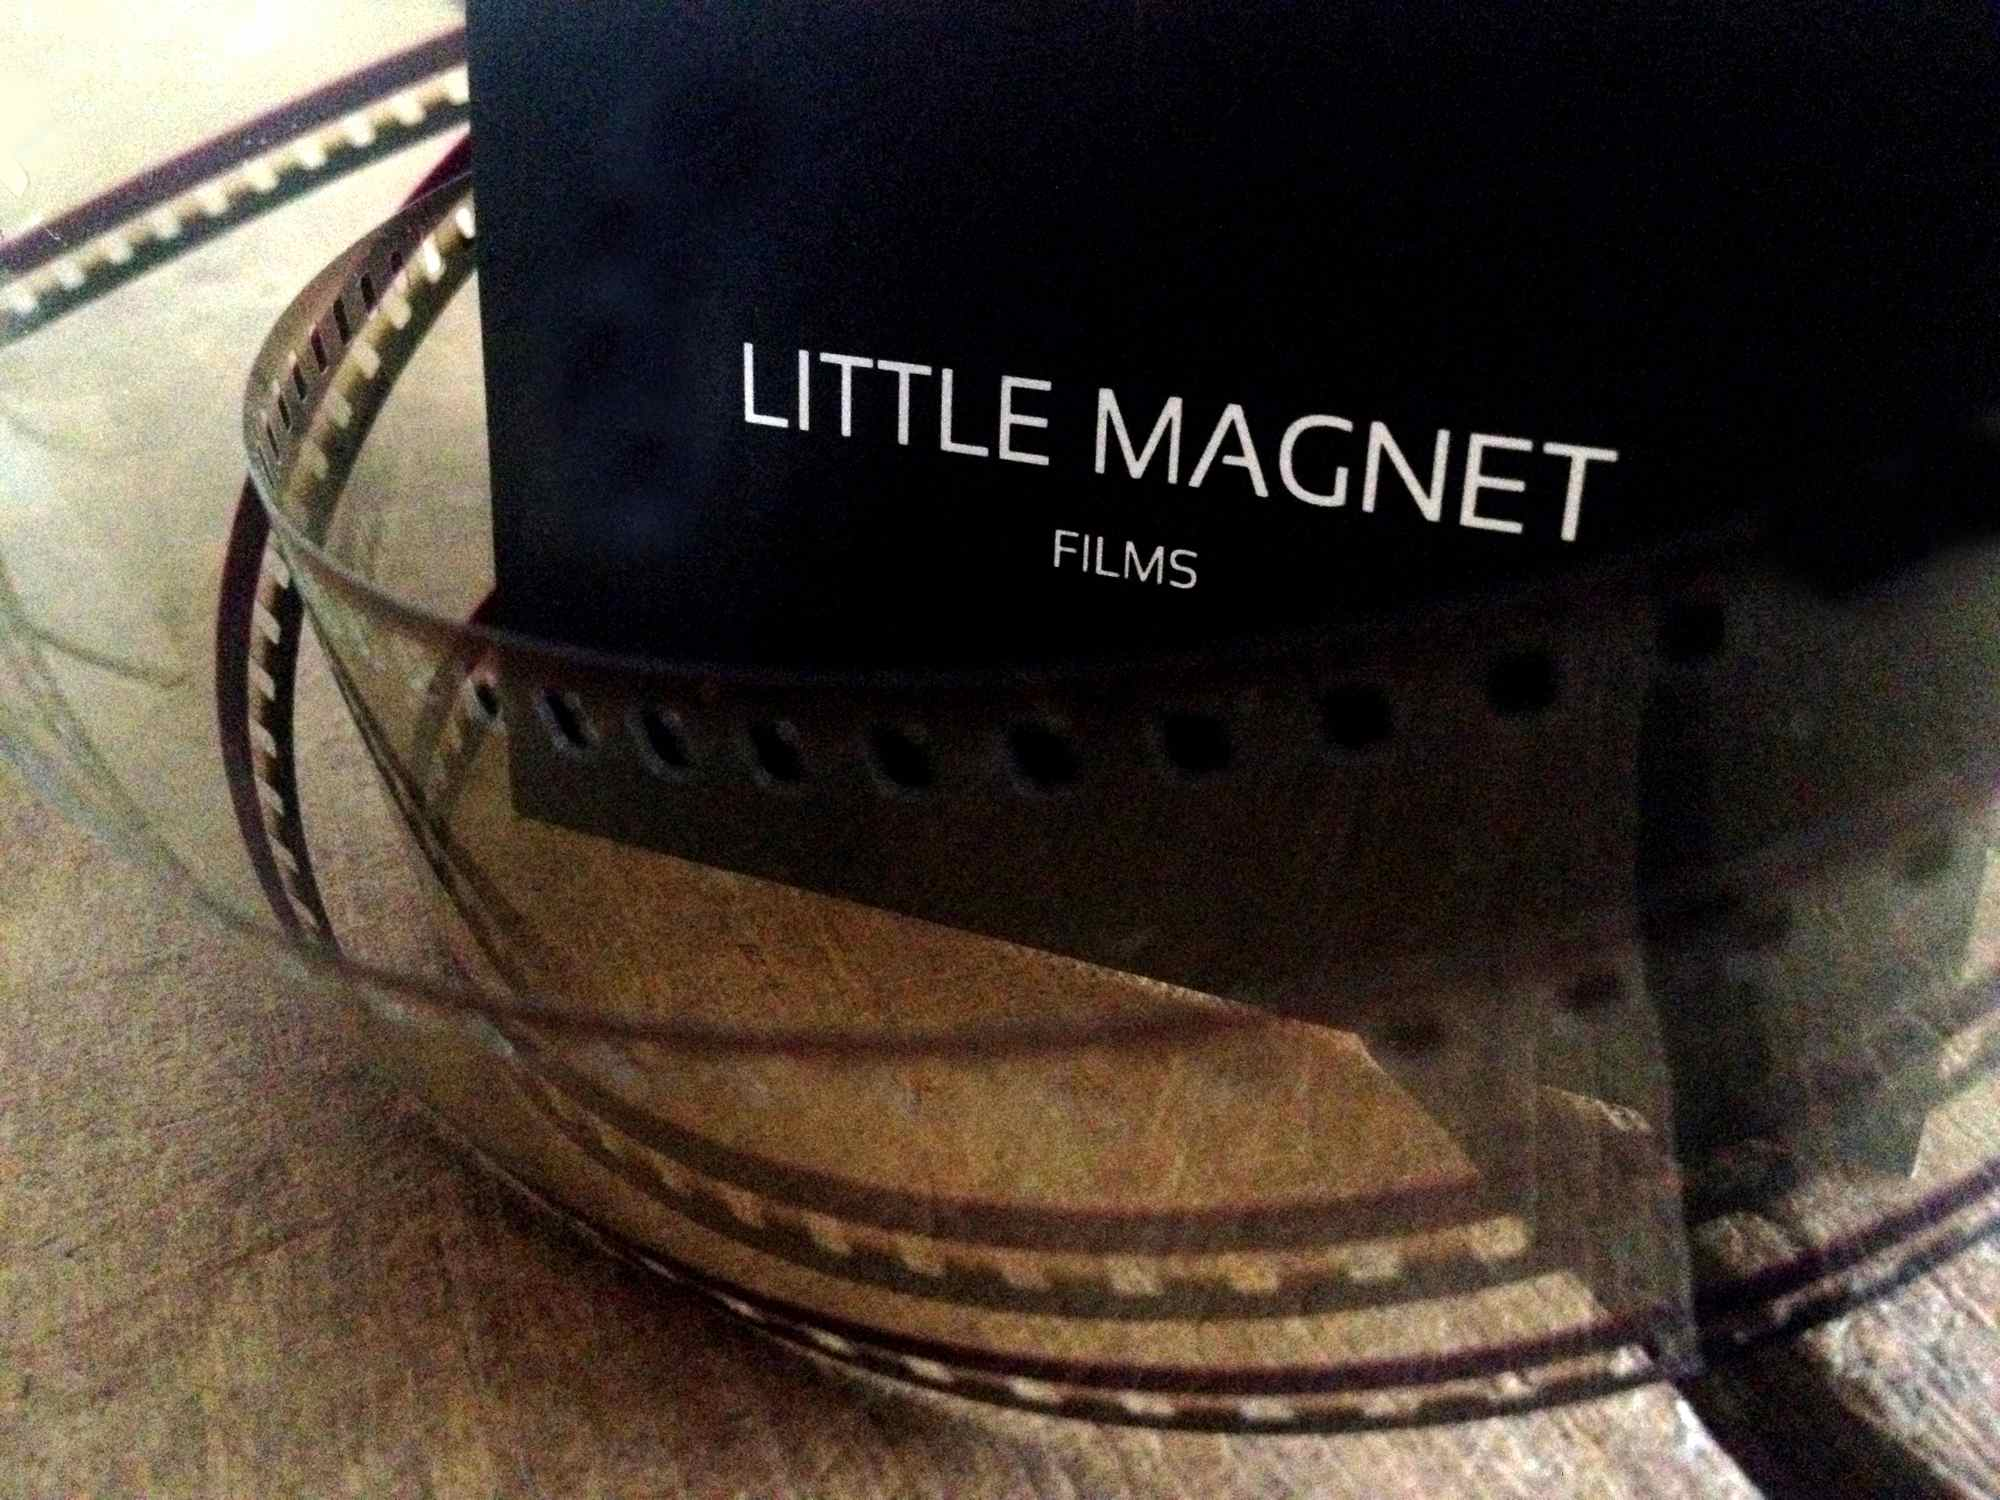 Visitenkarten für Little Magnet Films